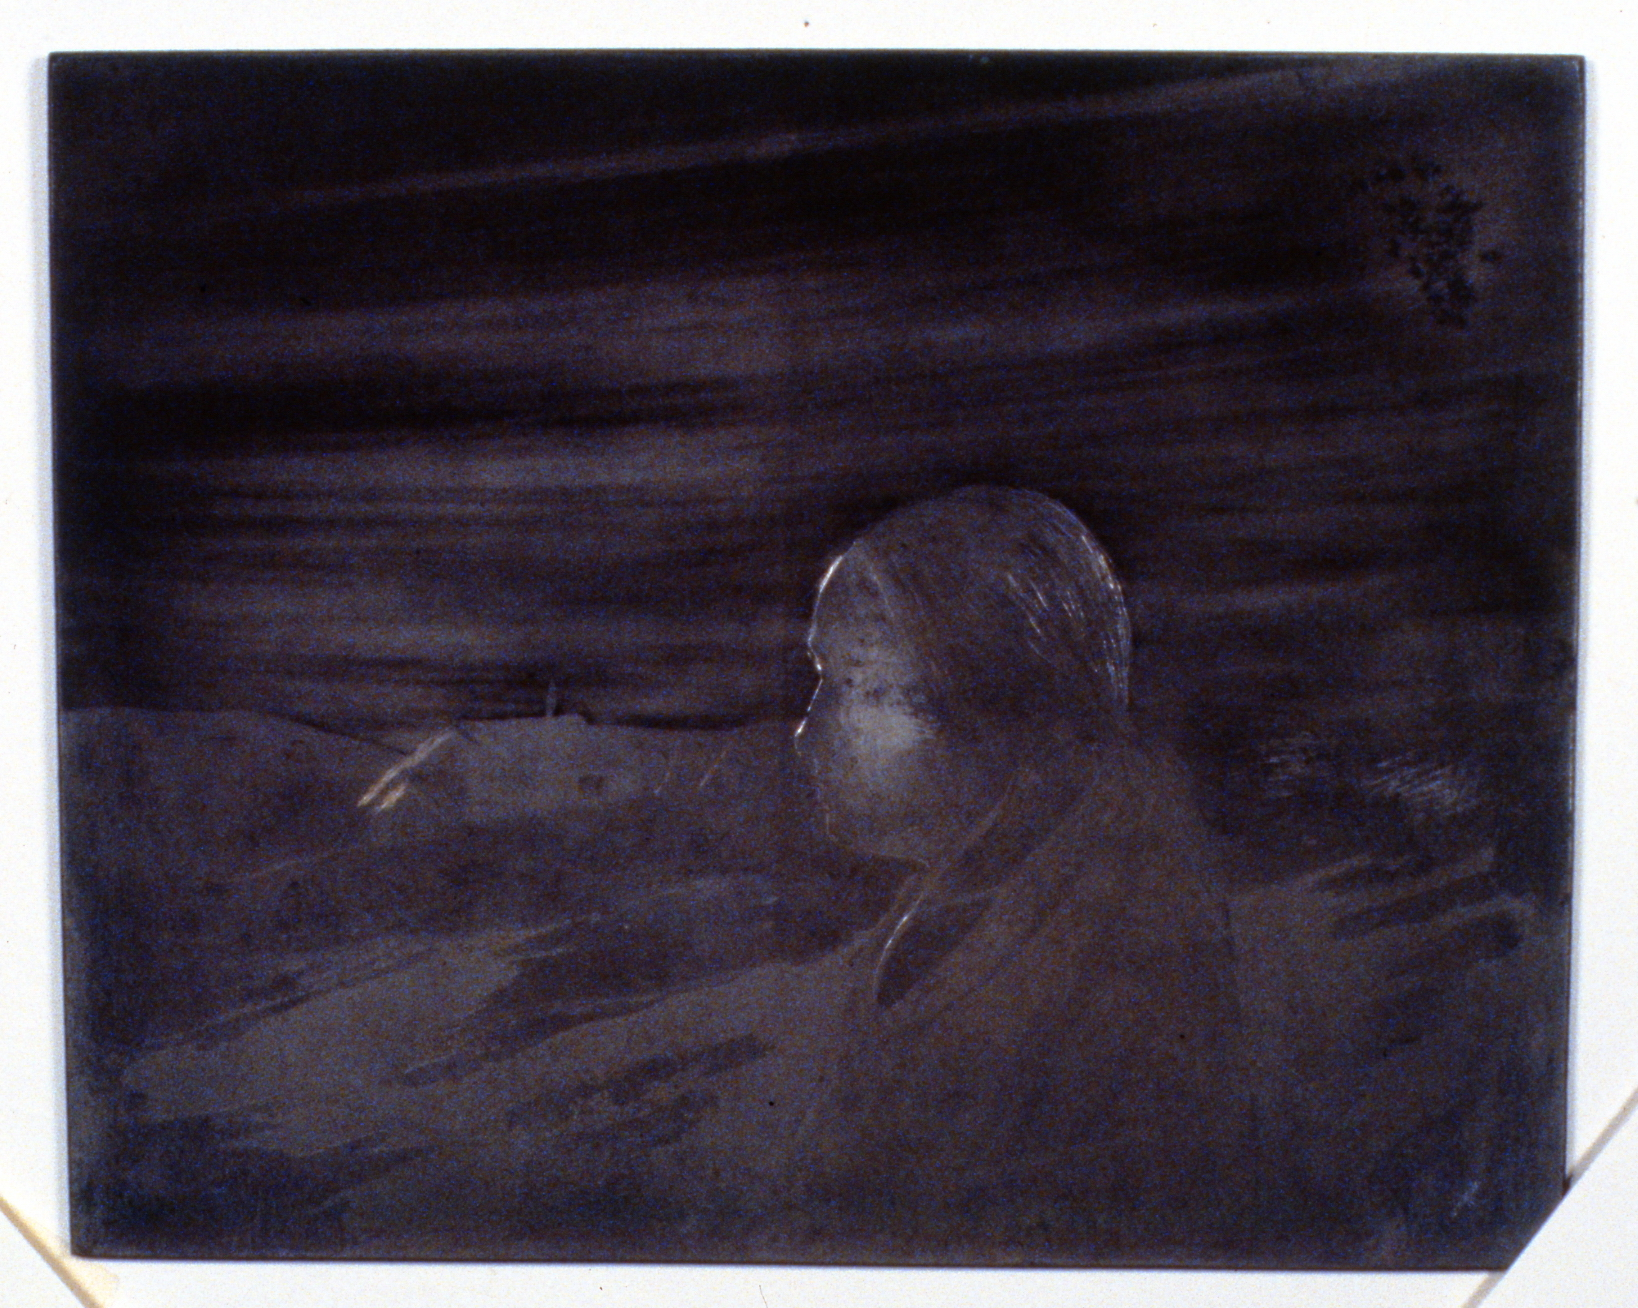 Teresa and Her Home , 1978, Minn Sjølseth, metal plate, 17.5 x 22 cm, 1996.02.16